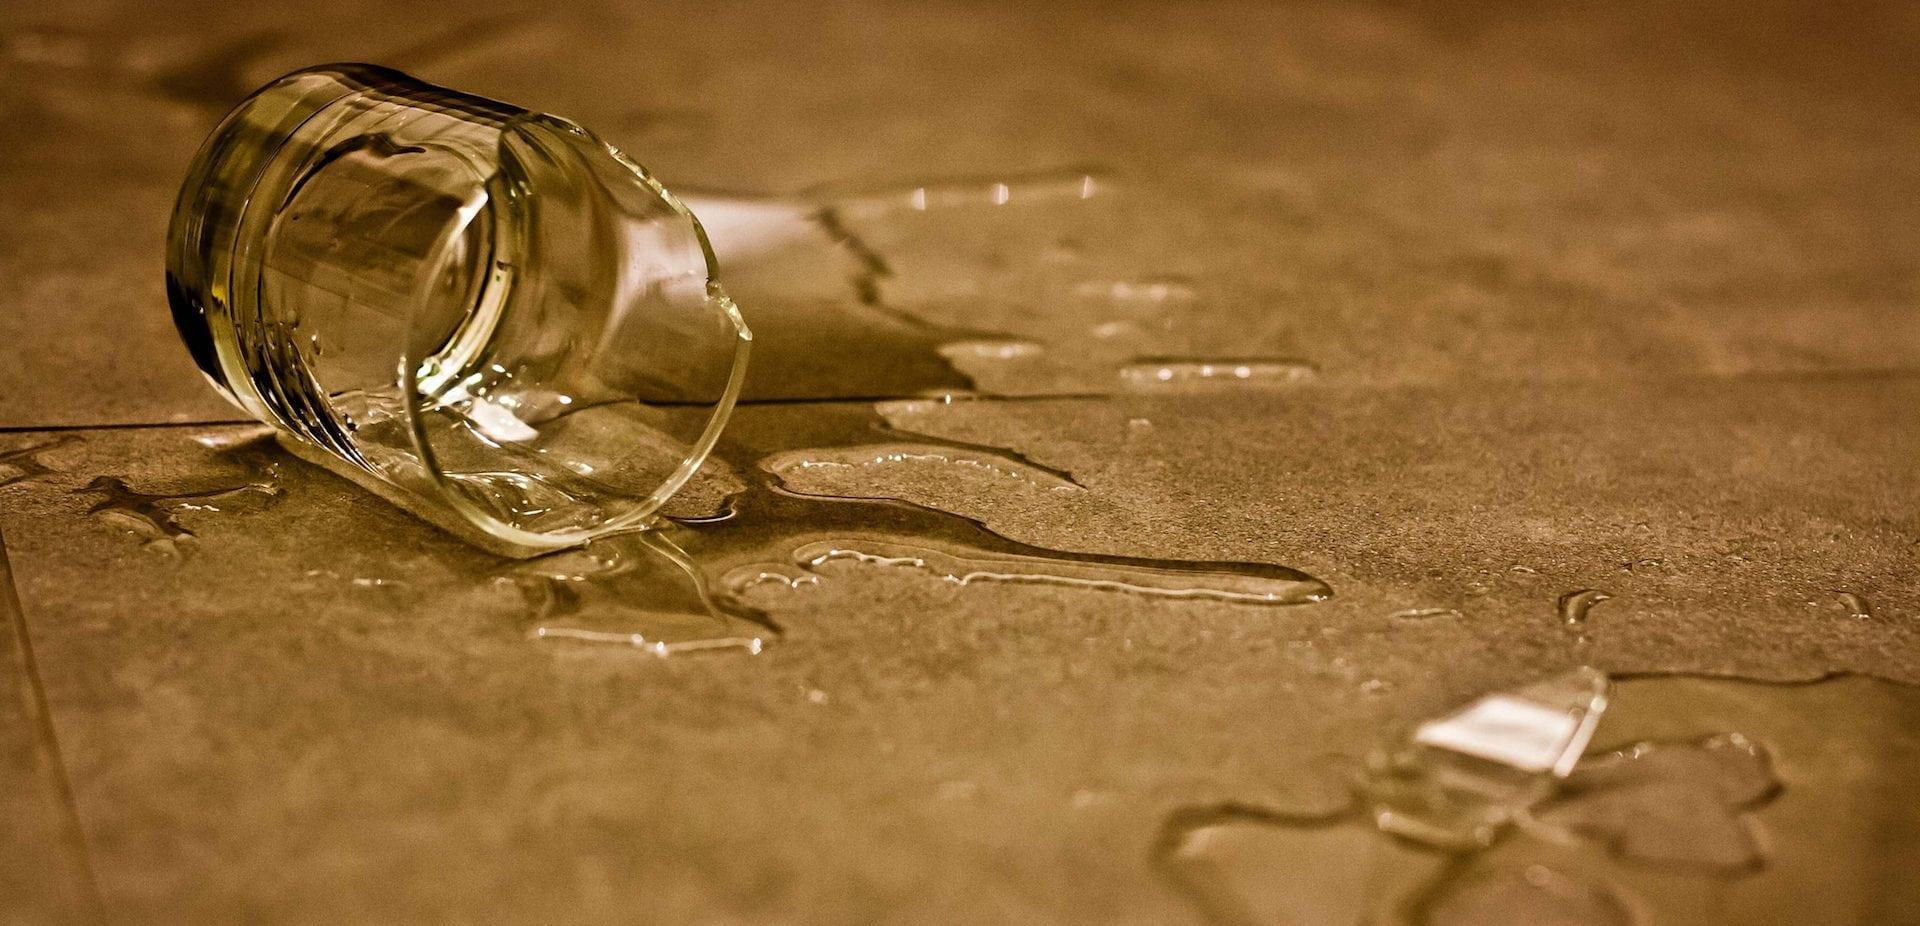 Tetap Taat Pada Suami, Walau Sering ada Masalah Rumah Tangga